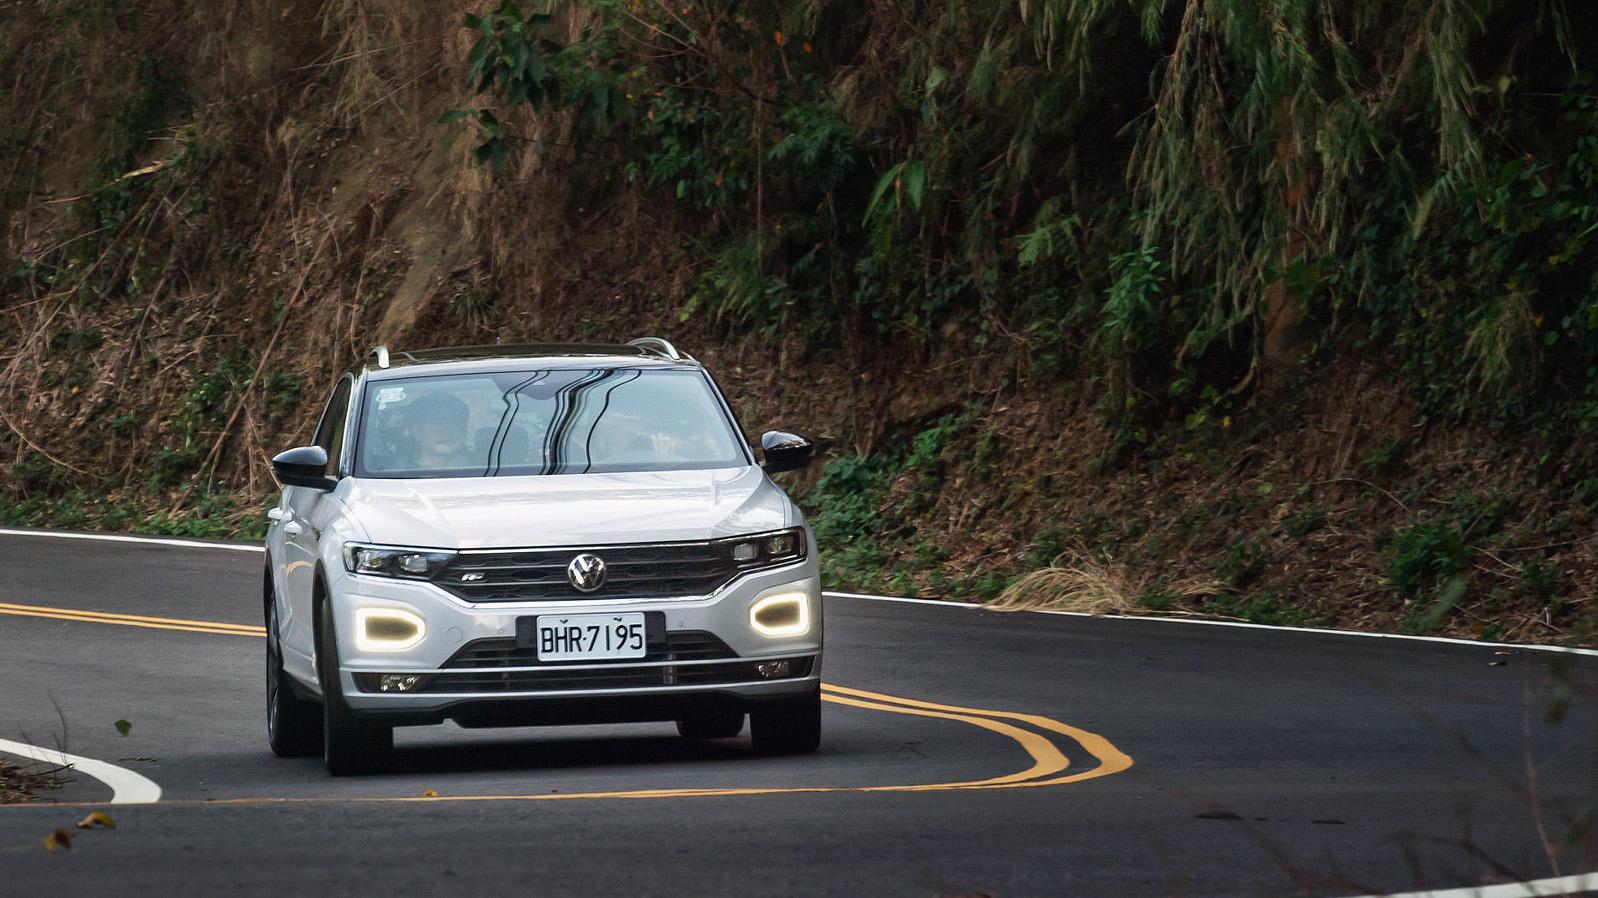 環保、性能兼具 Volkswagen 21 年式新車搭載最新 EA211 evo 引擎